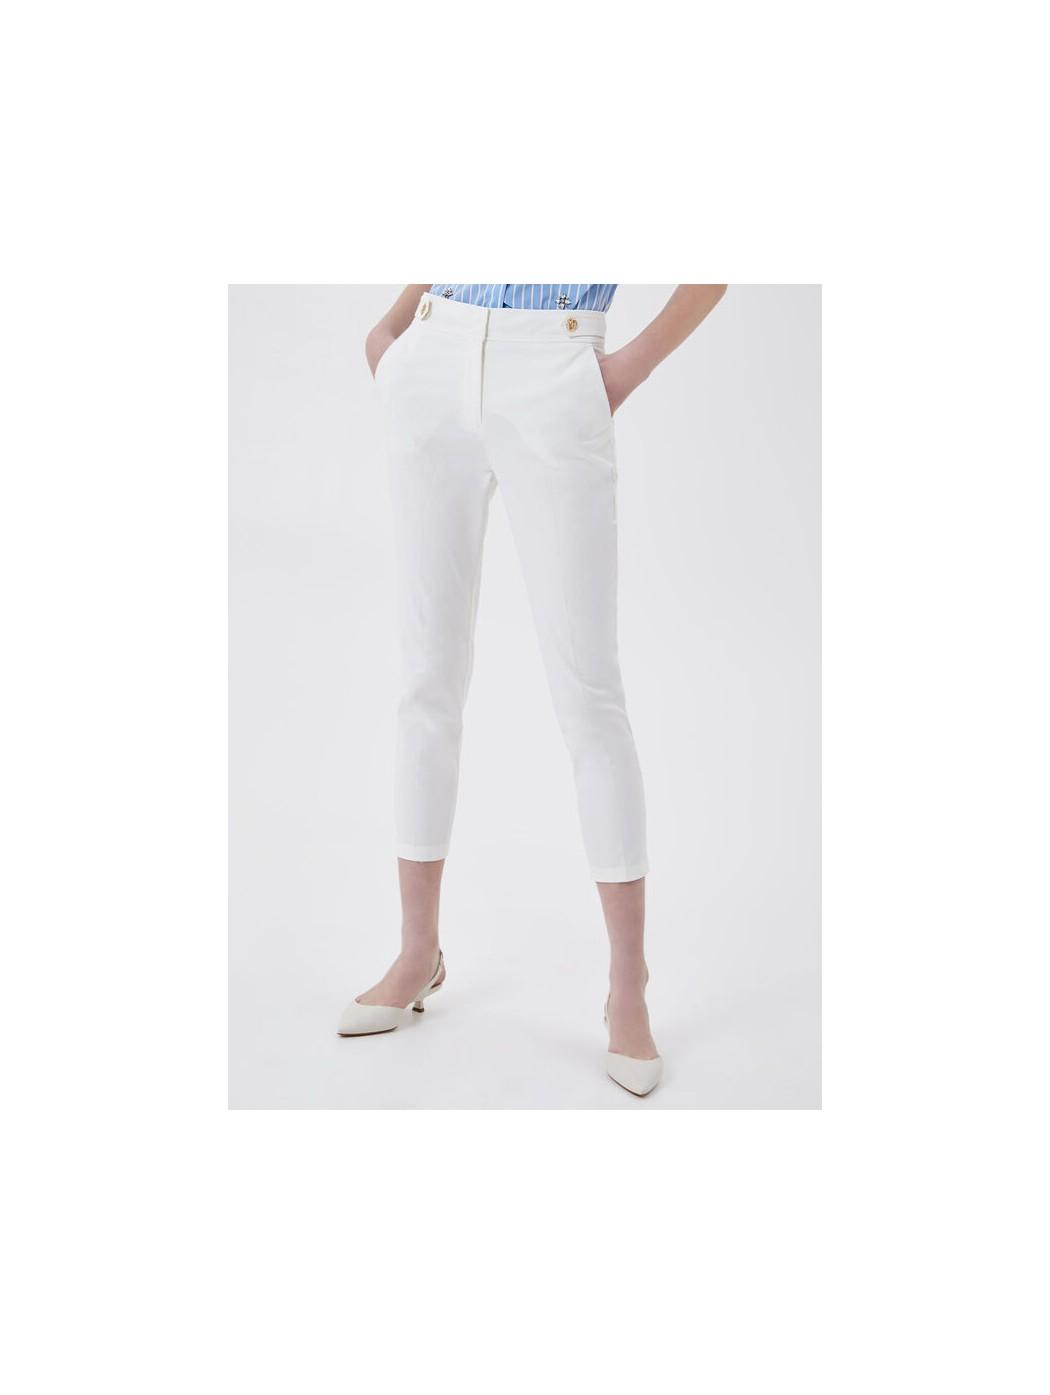 Pantalone cropped con bottoni LIU JO COLLECTION CA1005T2398 X0256